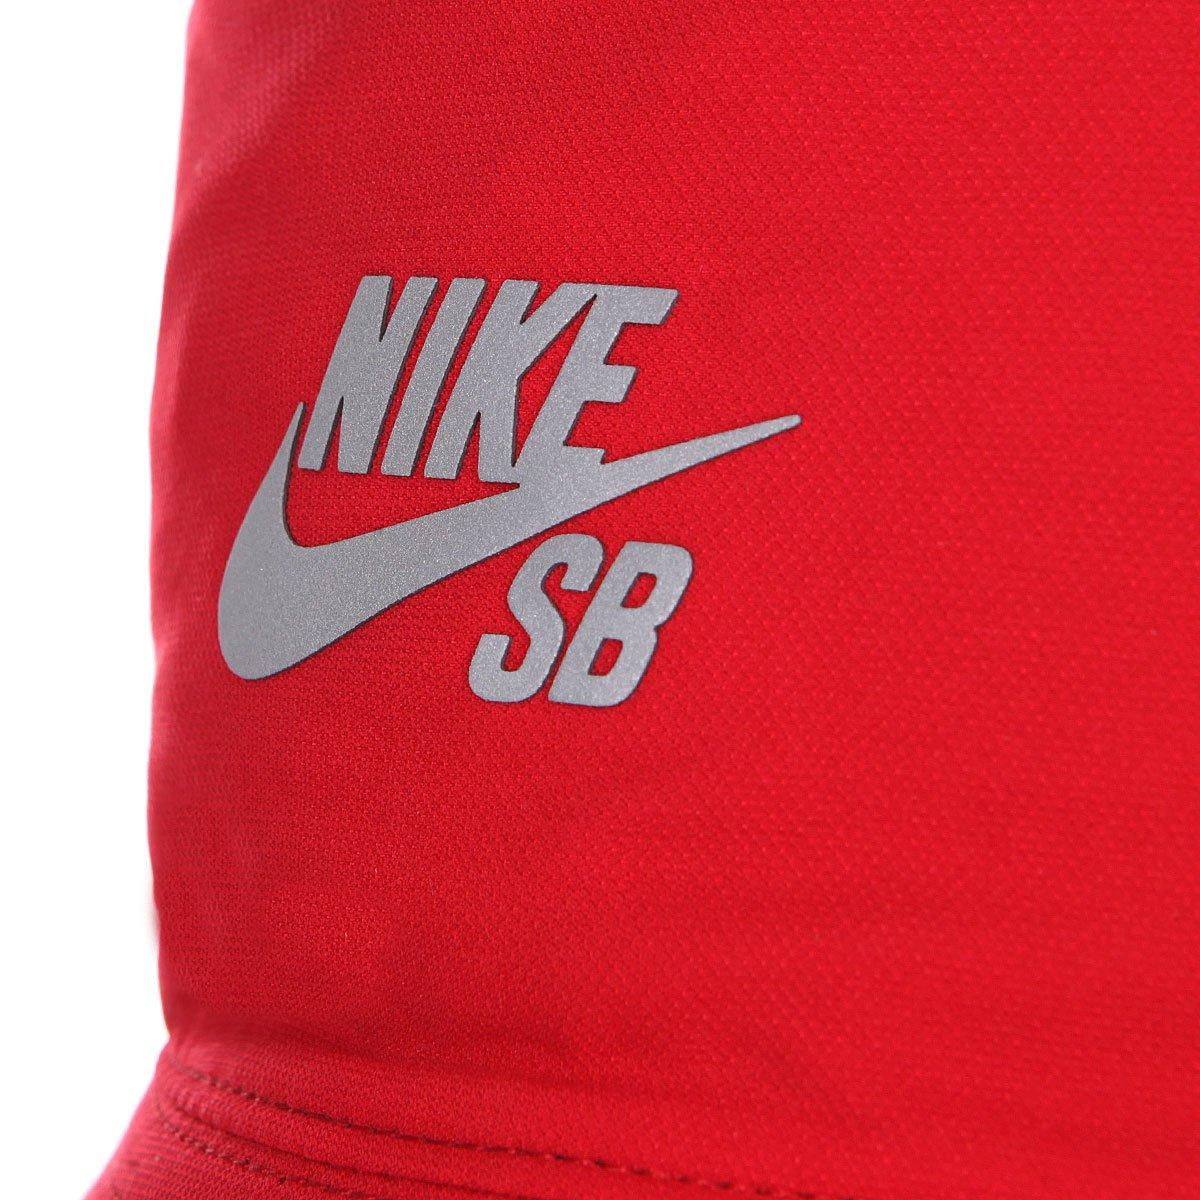 436369d65c51 Купить панаму Nike Performance Bucket Gym Red Black (659425-687) в ...